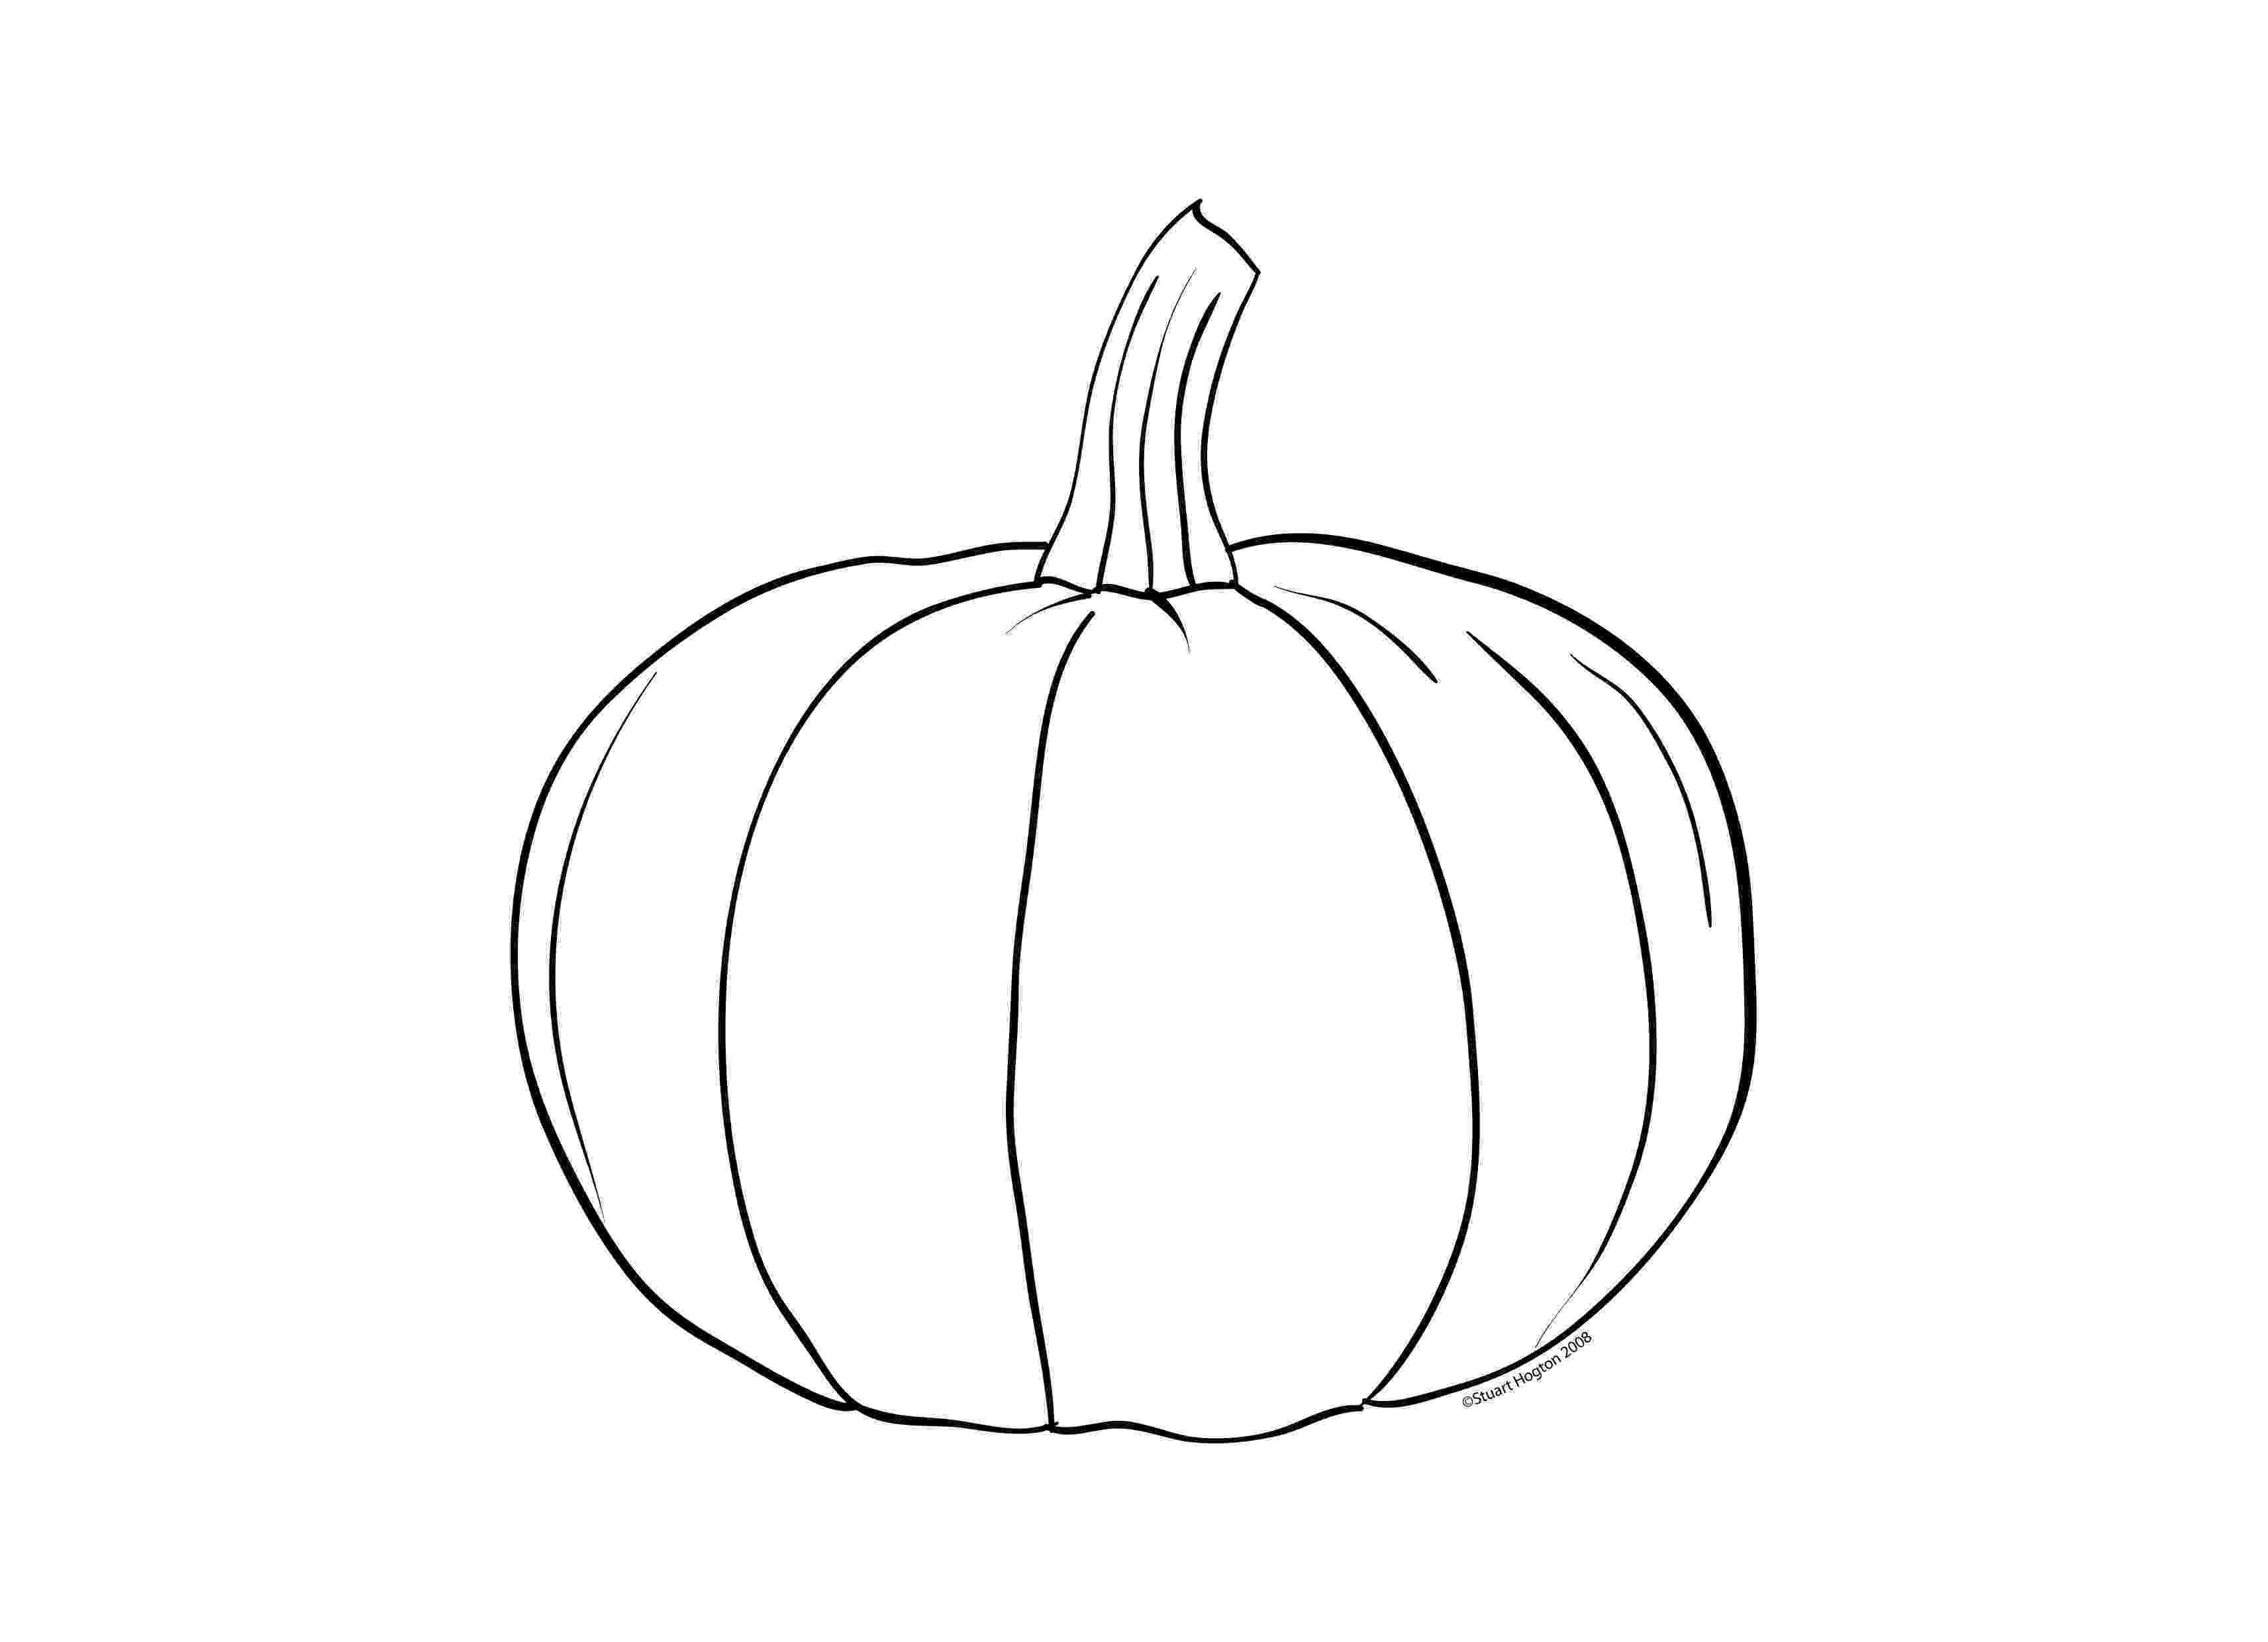 color a pumpkin free printable pumpkin coloring pages for kids pumpkin color a 1 1